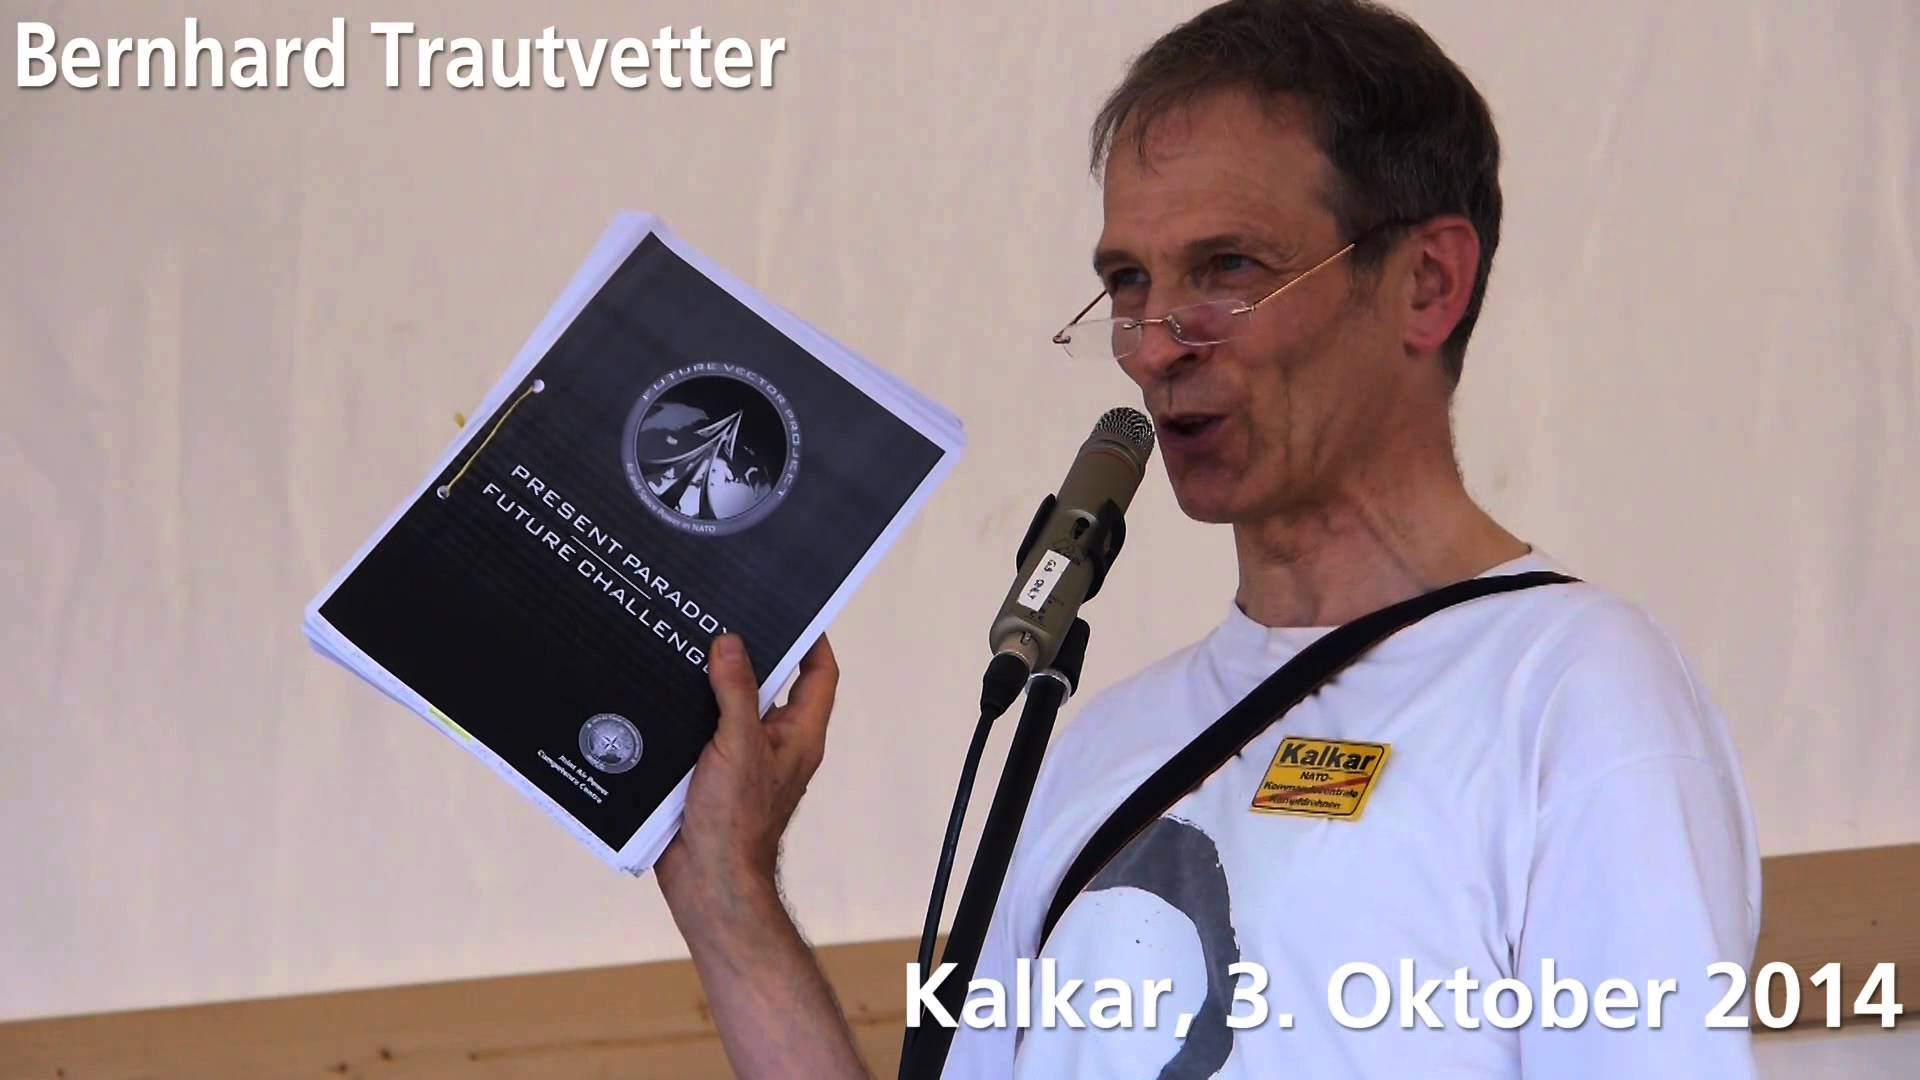 Rede Bernhard Trautvetter – 03.10.2014 Kalkar